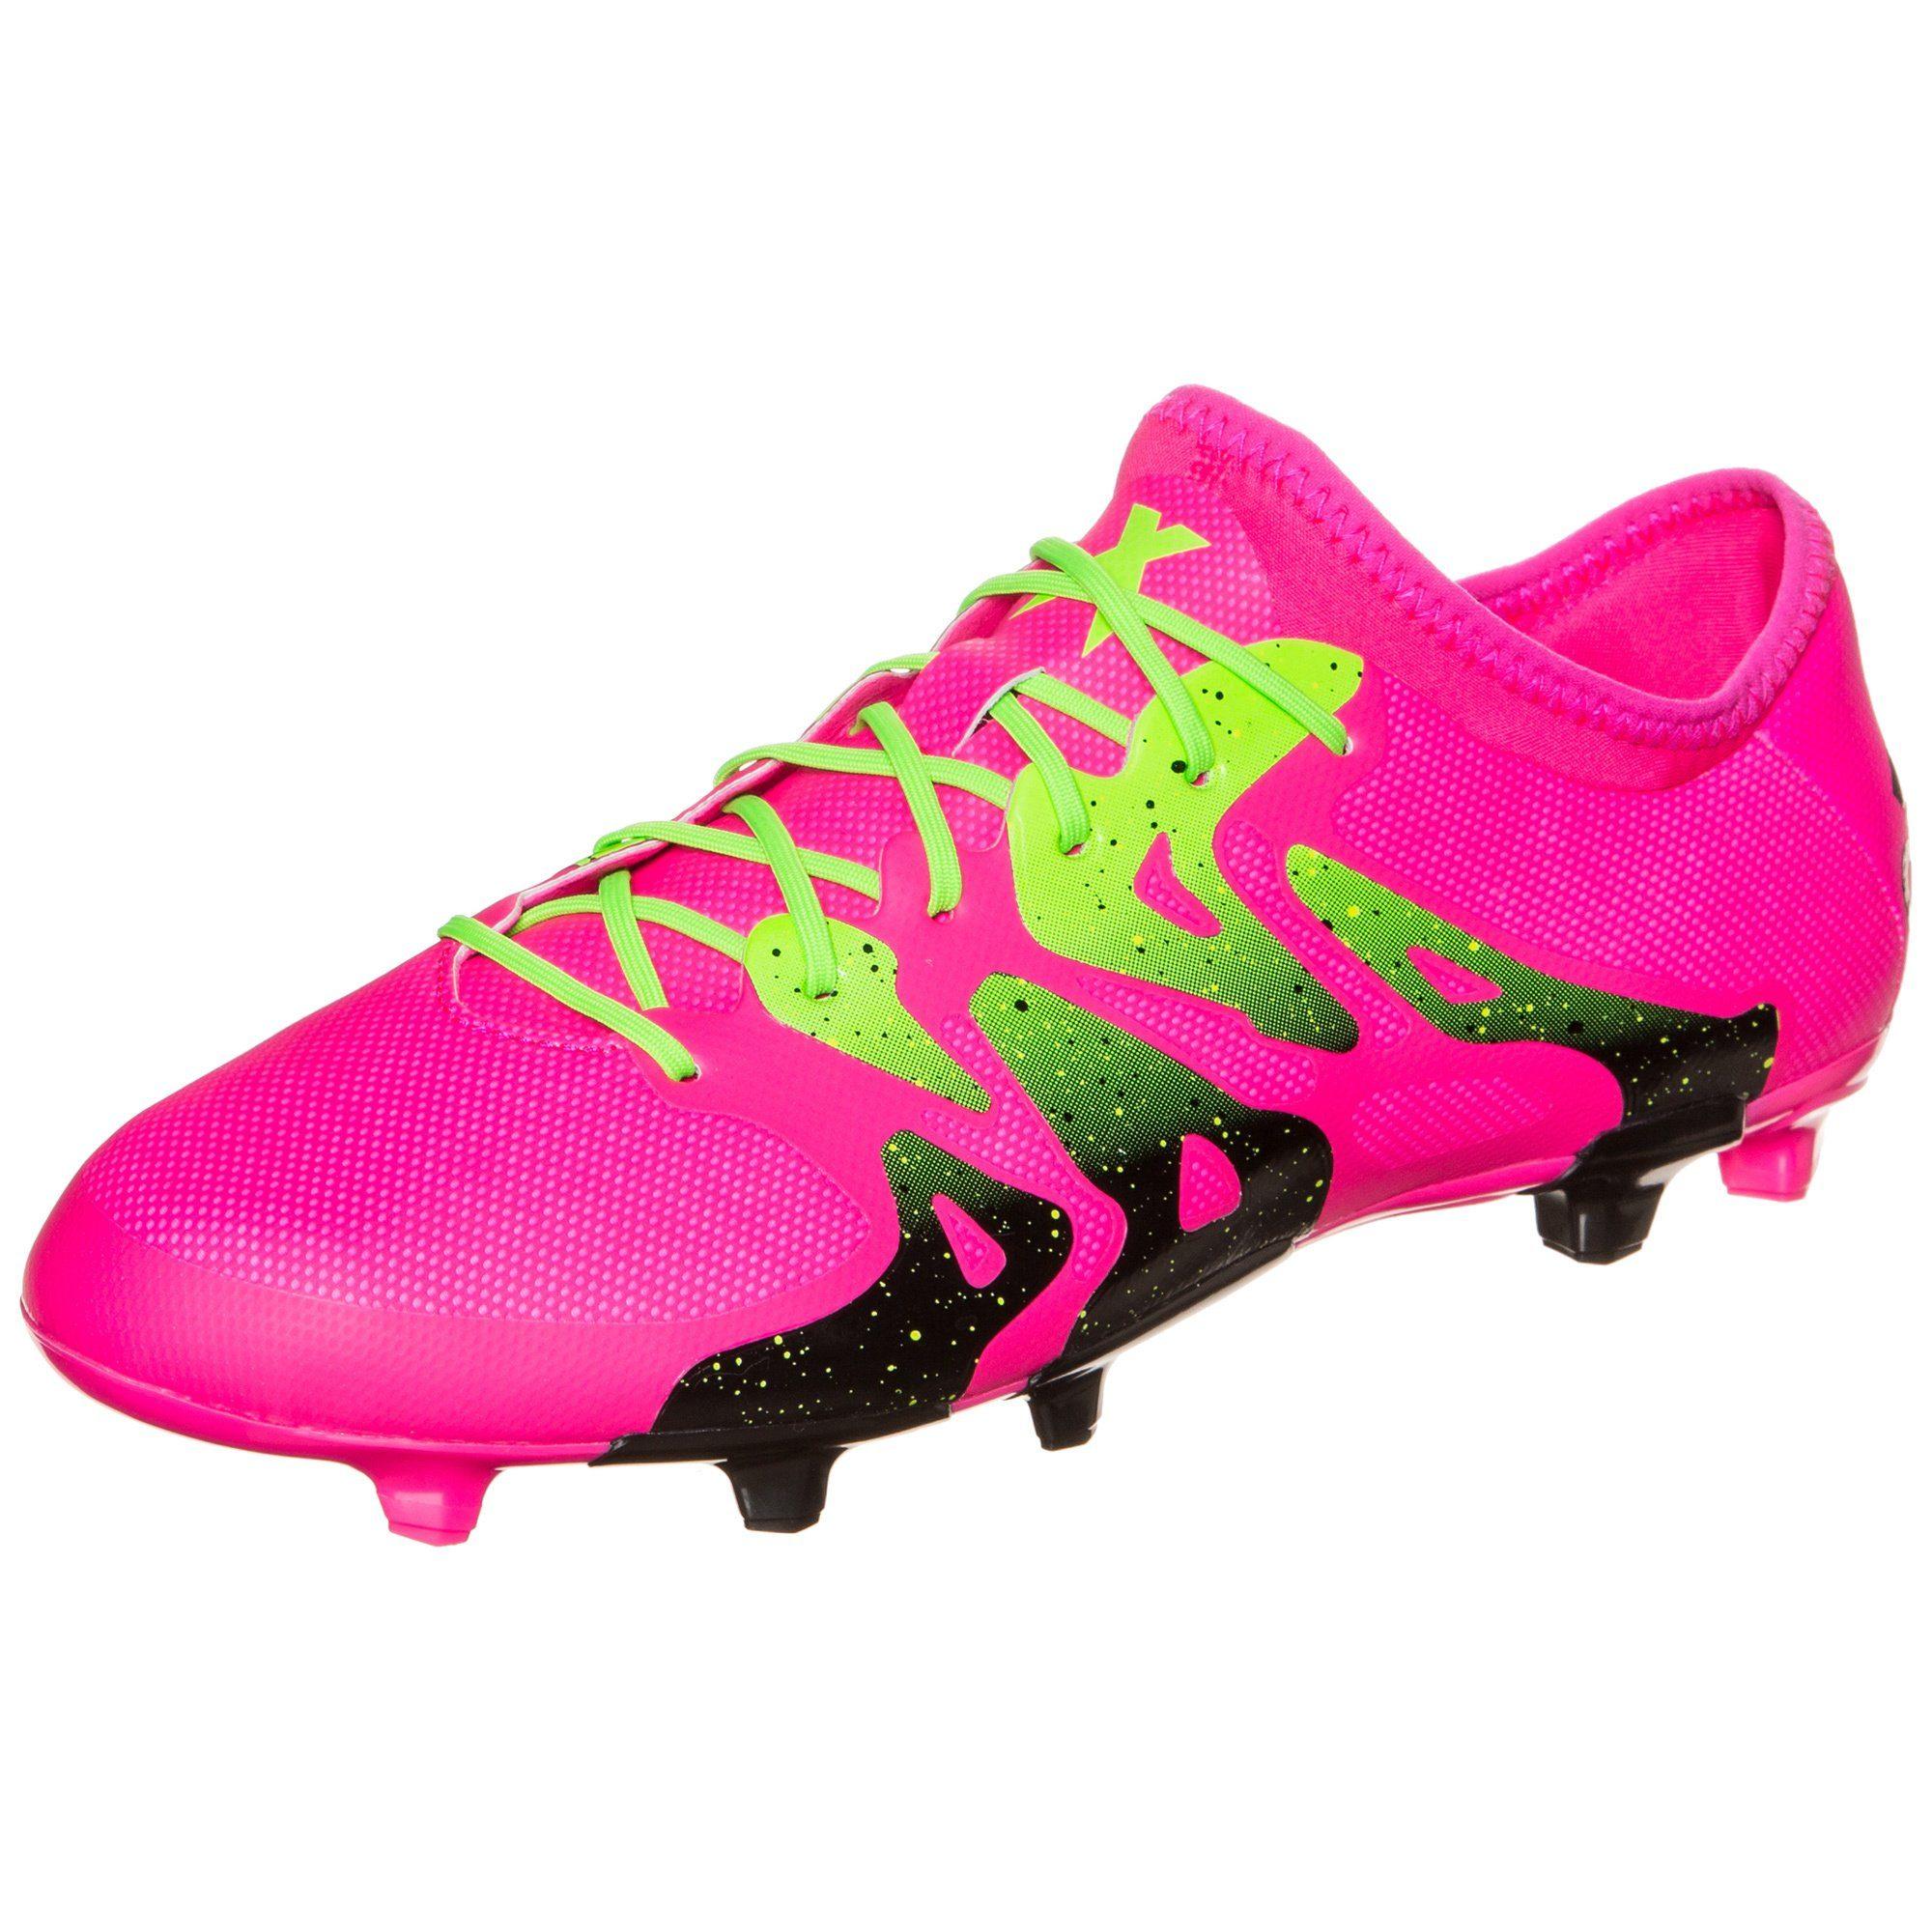 adidas Performance X 152 FG/AG Fußballschuh Herren | Schuhe > Sportschuhe | Rosa | Adidas Performance